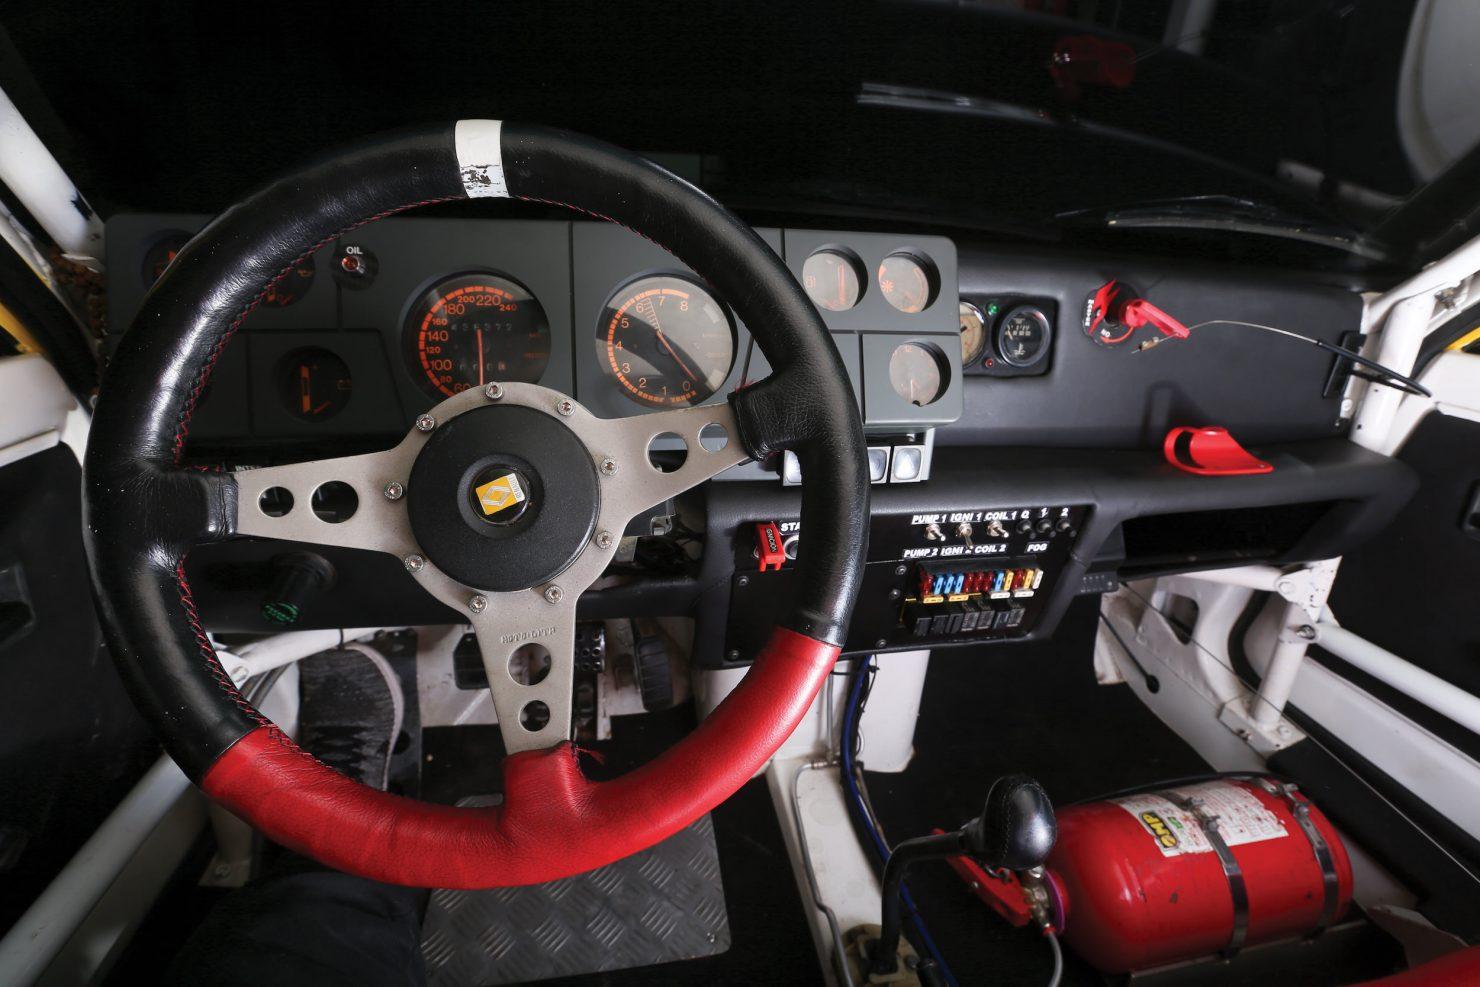 Renault 5 Turbo 9 1480x987 - 1980 Renault 5 Turbo